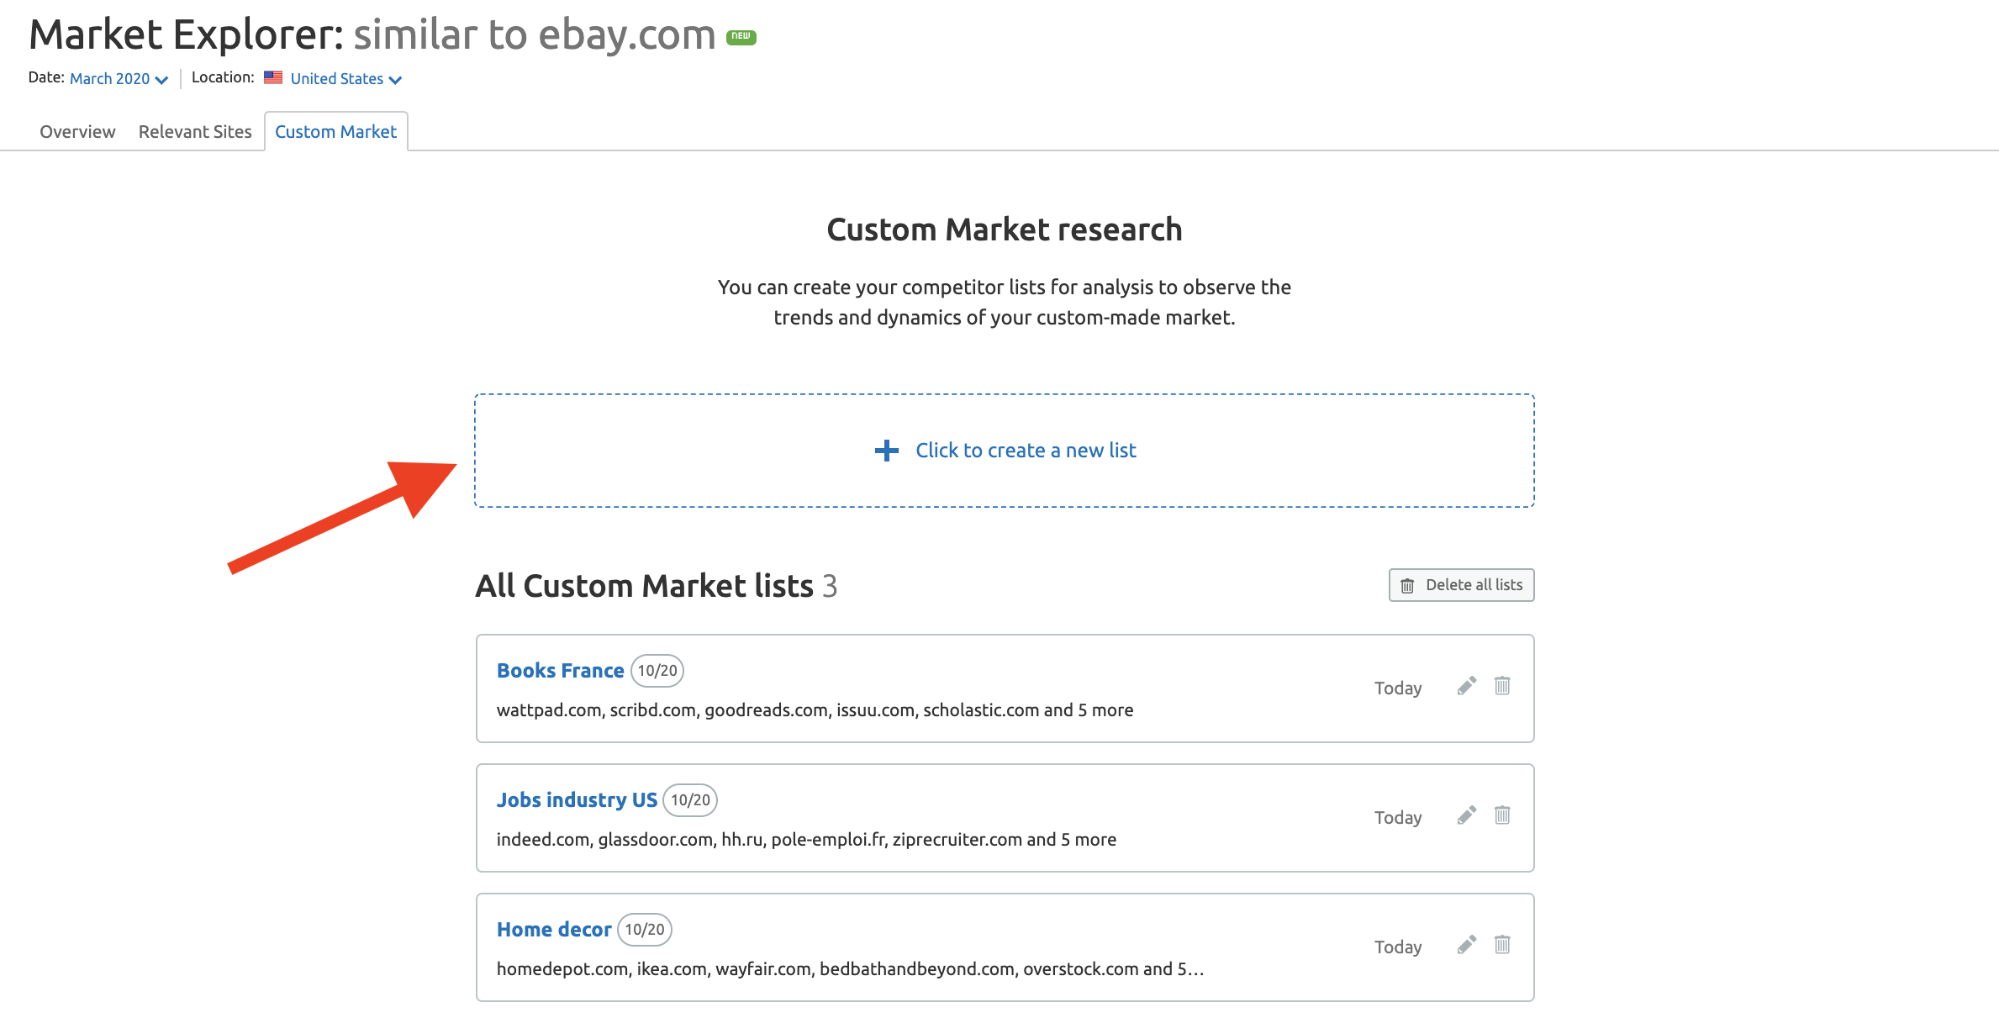 Novedades de SEMrush - Abril 2020 - Custom market